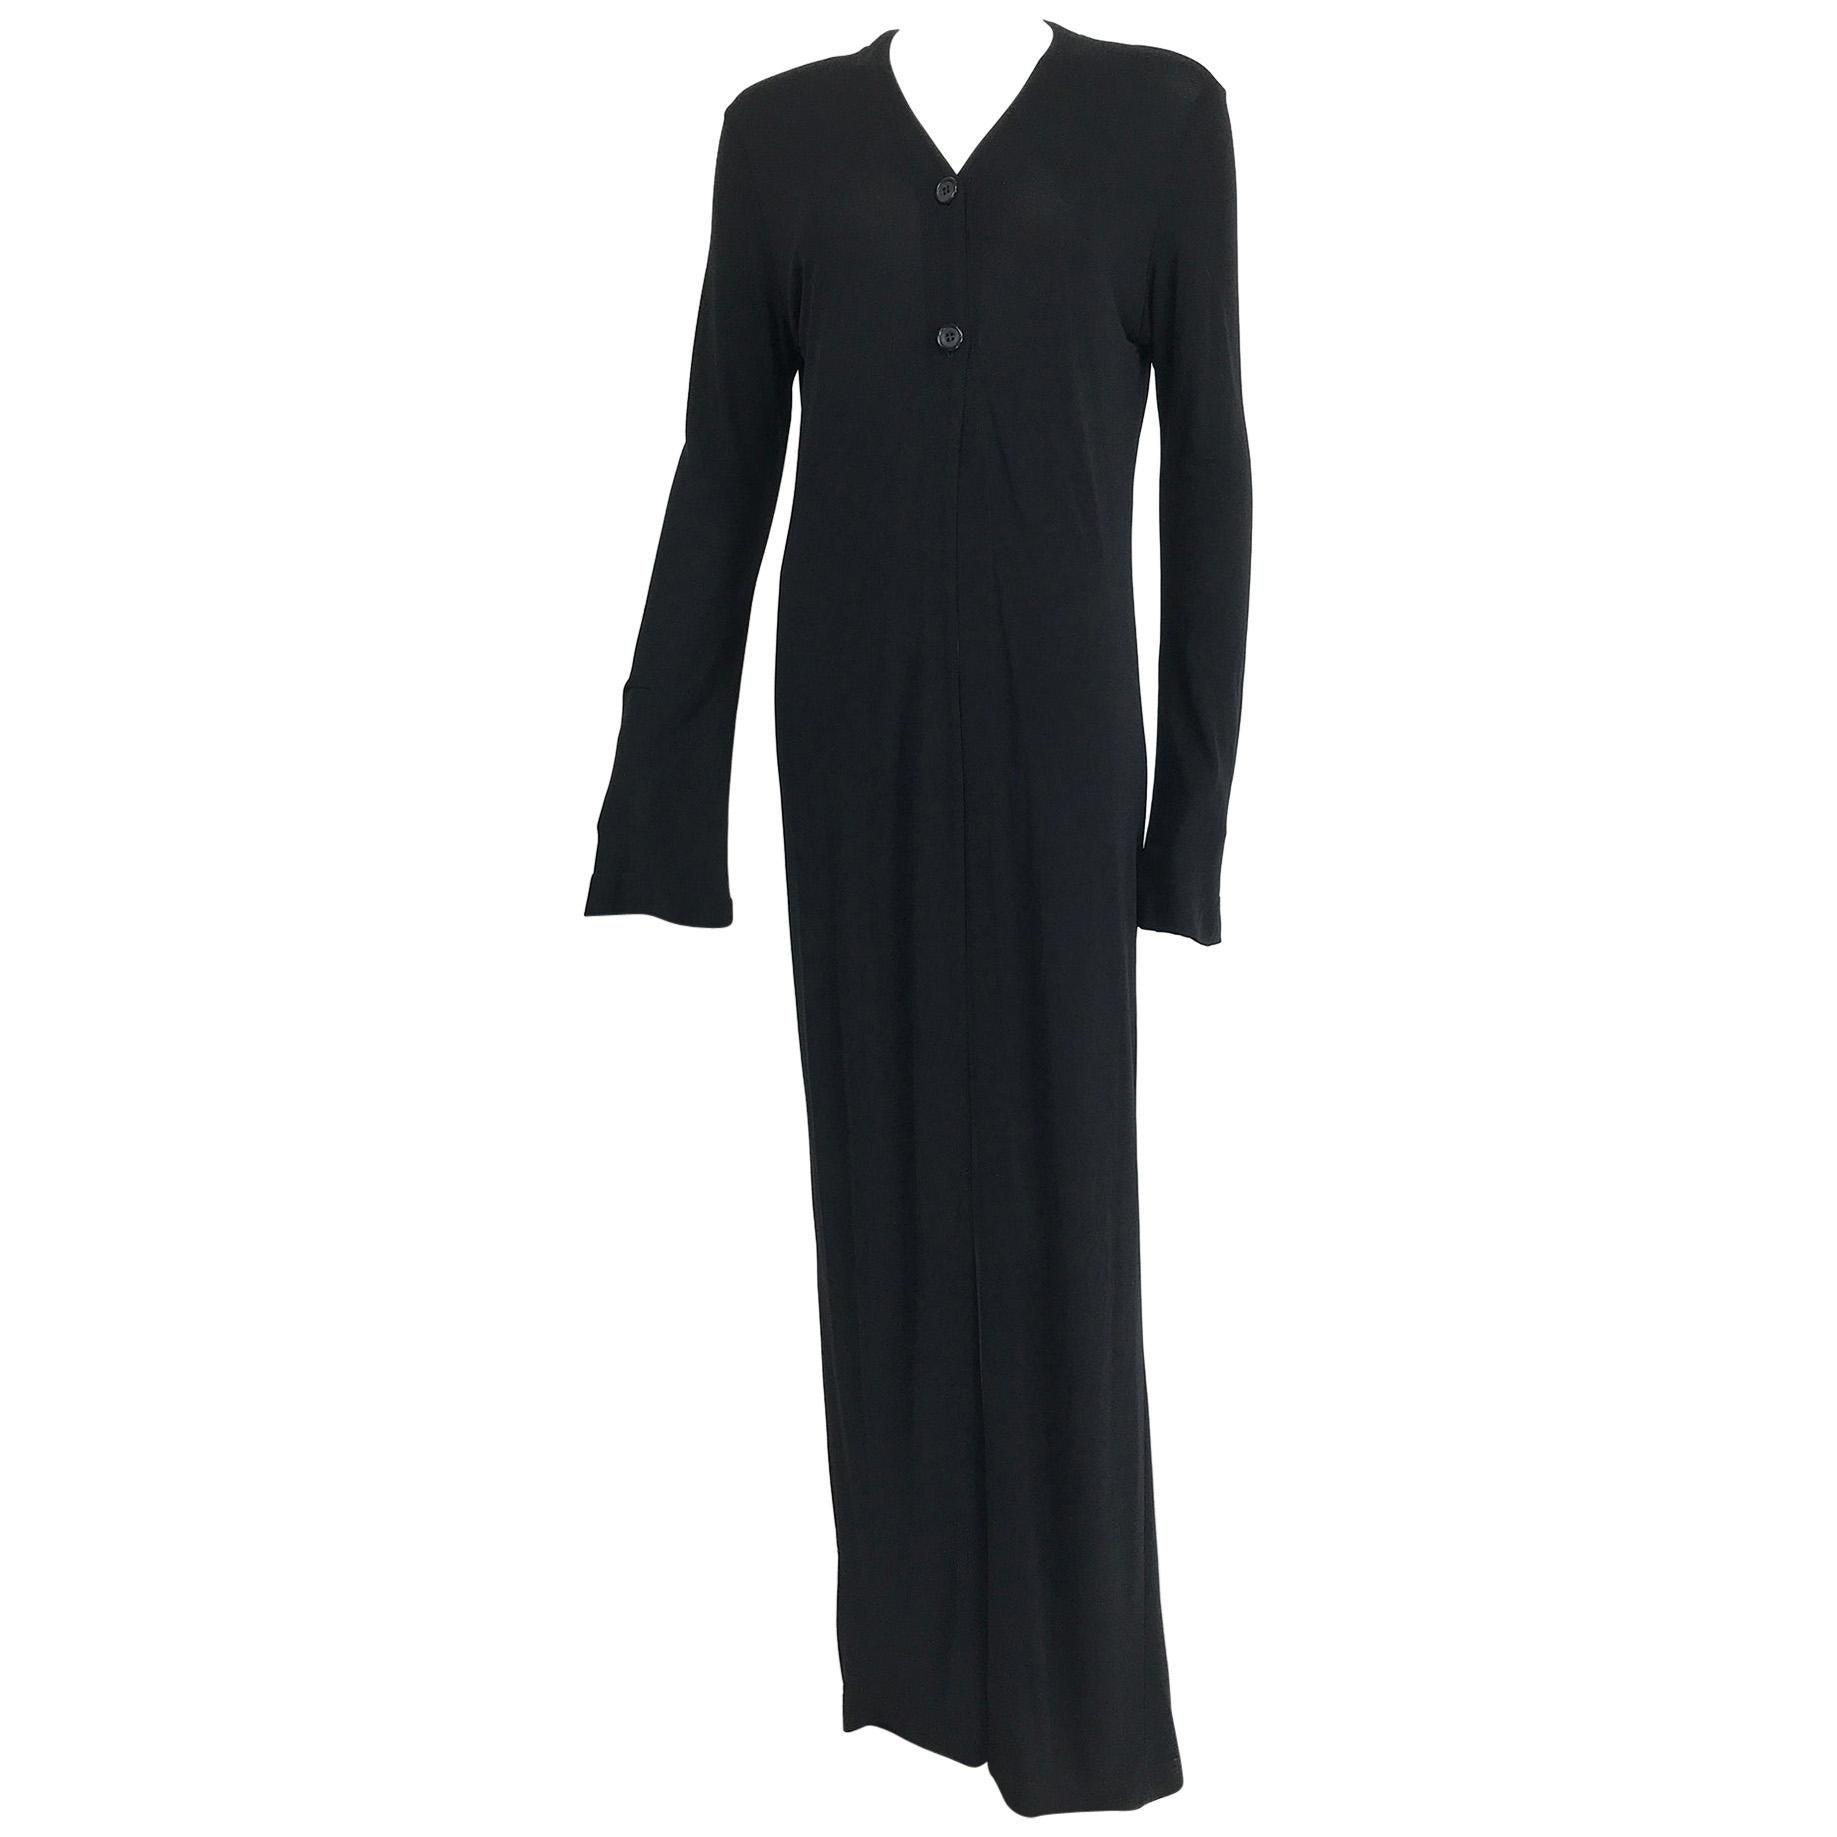 Vintage Calvin Klein Minimalist Black Jersey Maxi Coat 1990s